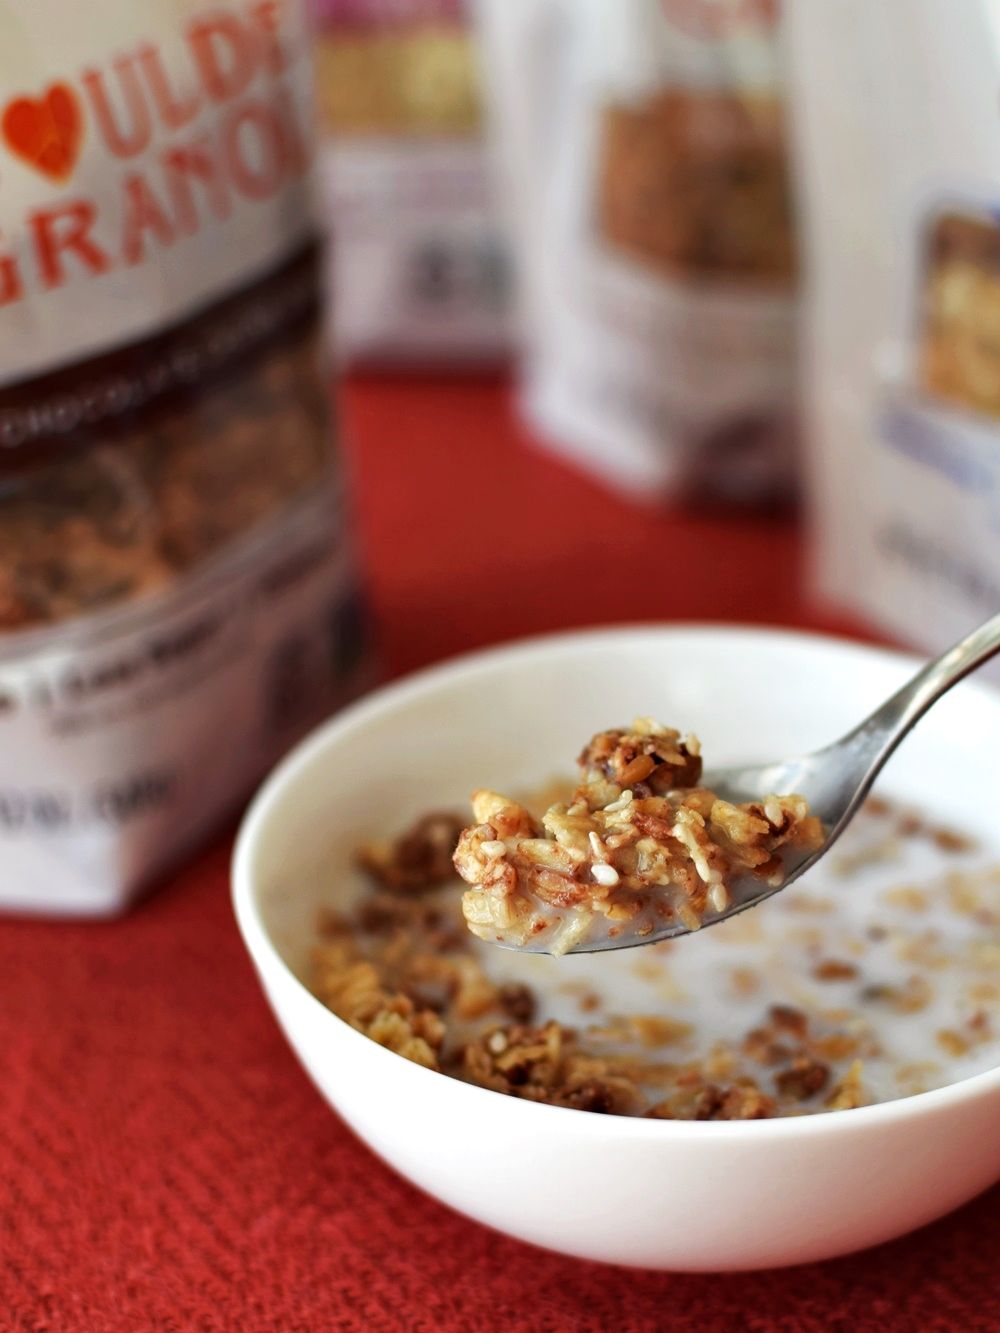 Boulder Granola - 4 Organic Flavors - All Low Sugar, Dairy-Free, Vegan, and Gluten-Free